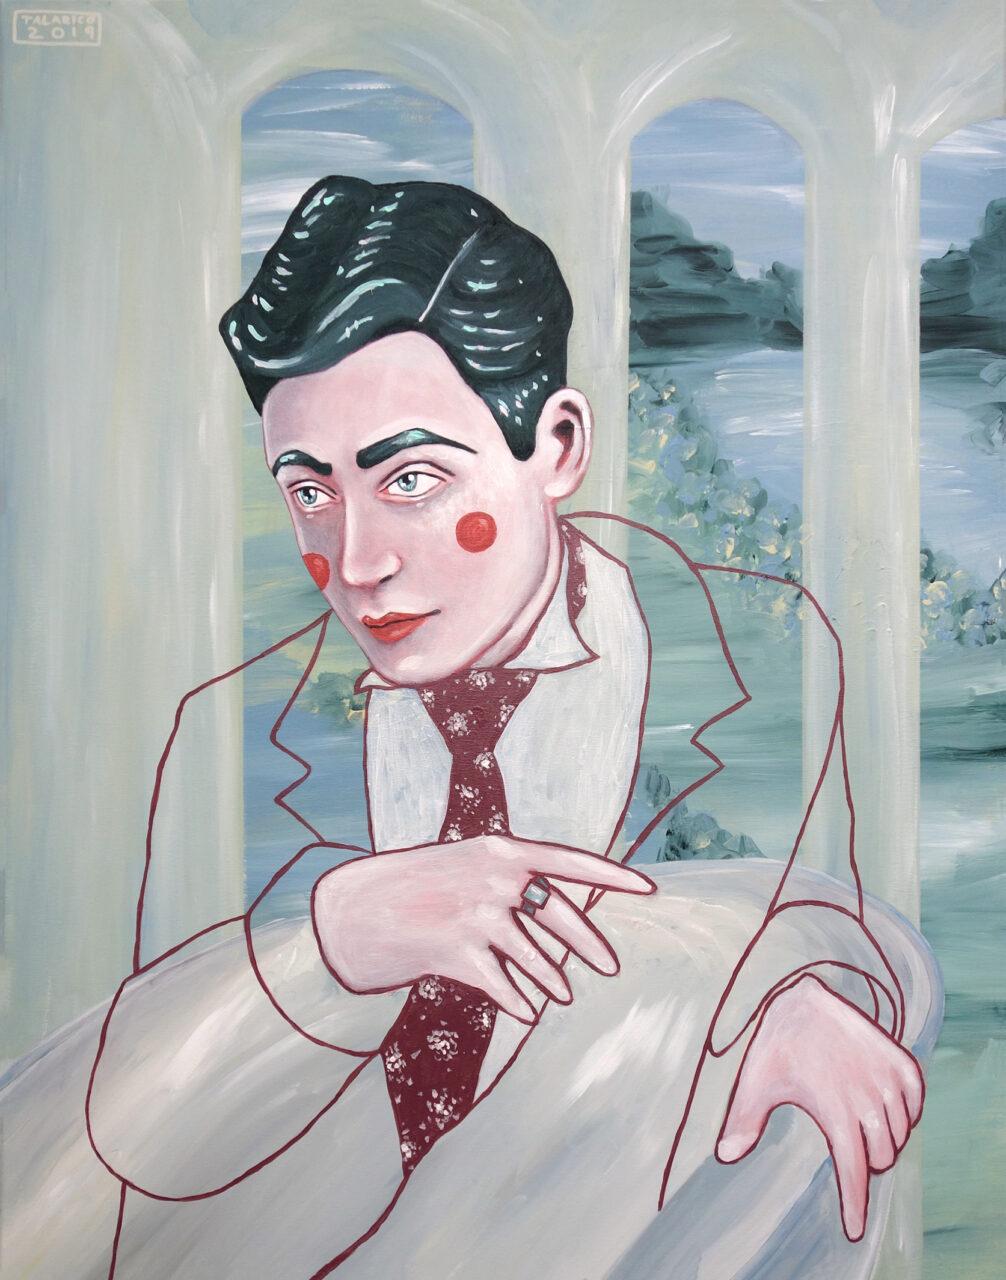 """Blurring Boundaries Between Far And Away #06"" (Self Portrait) • 80 x 100cm • Acryl on canvas • 2019"